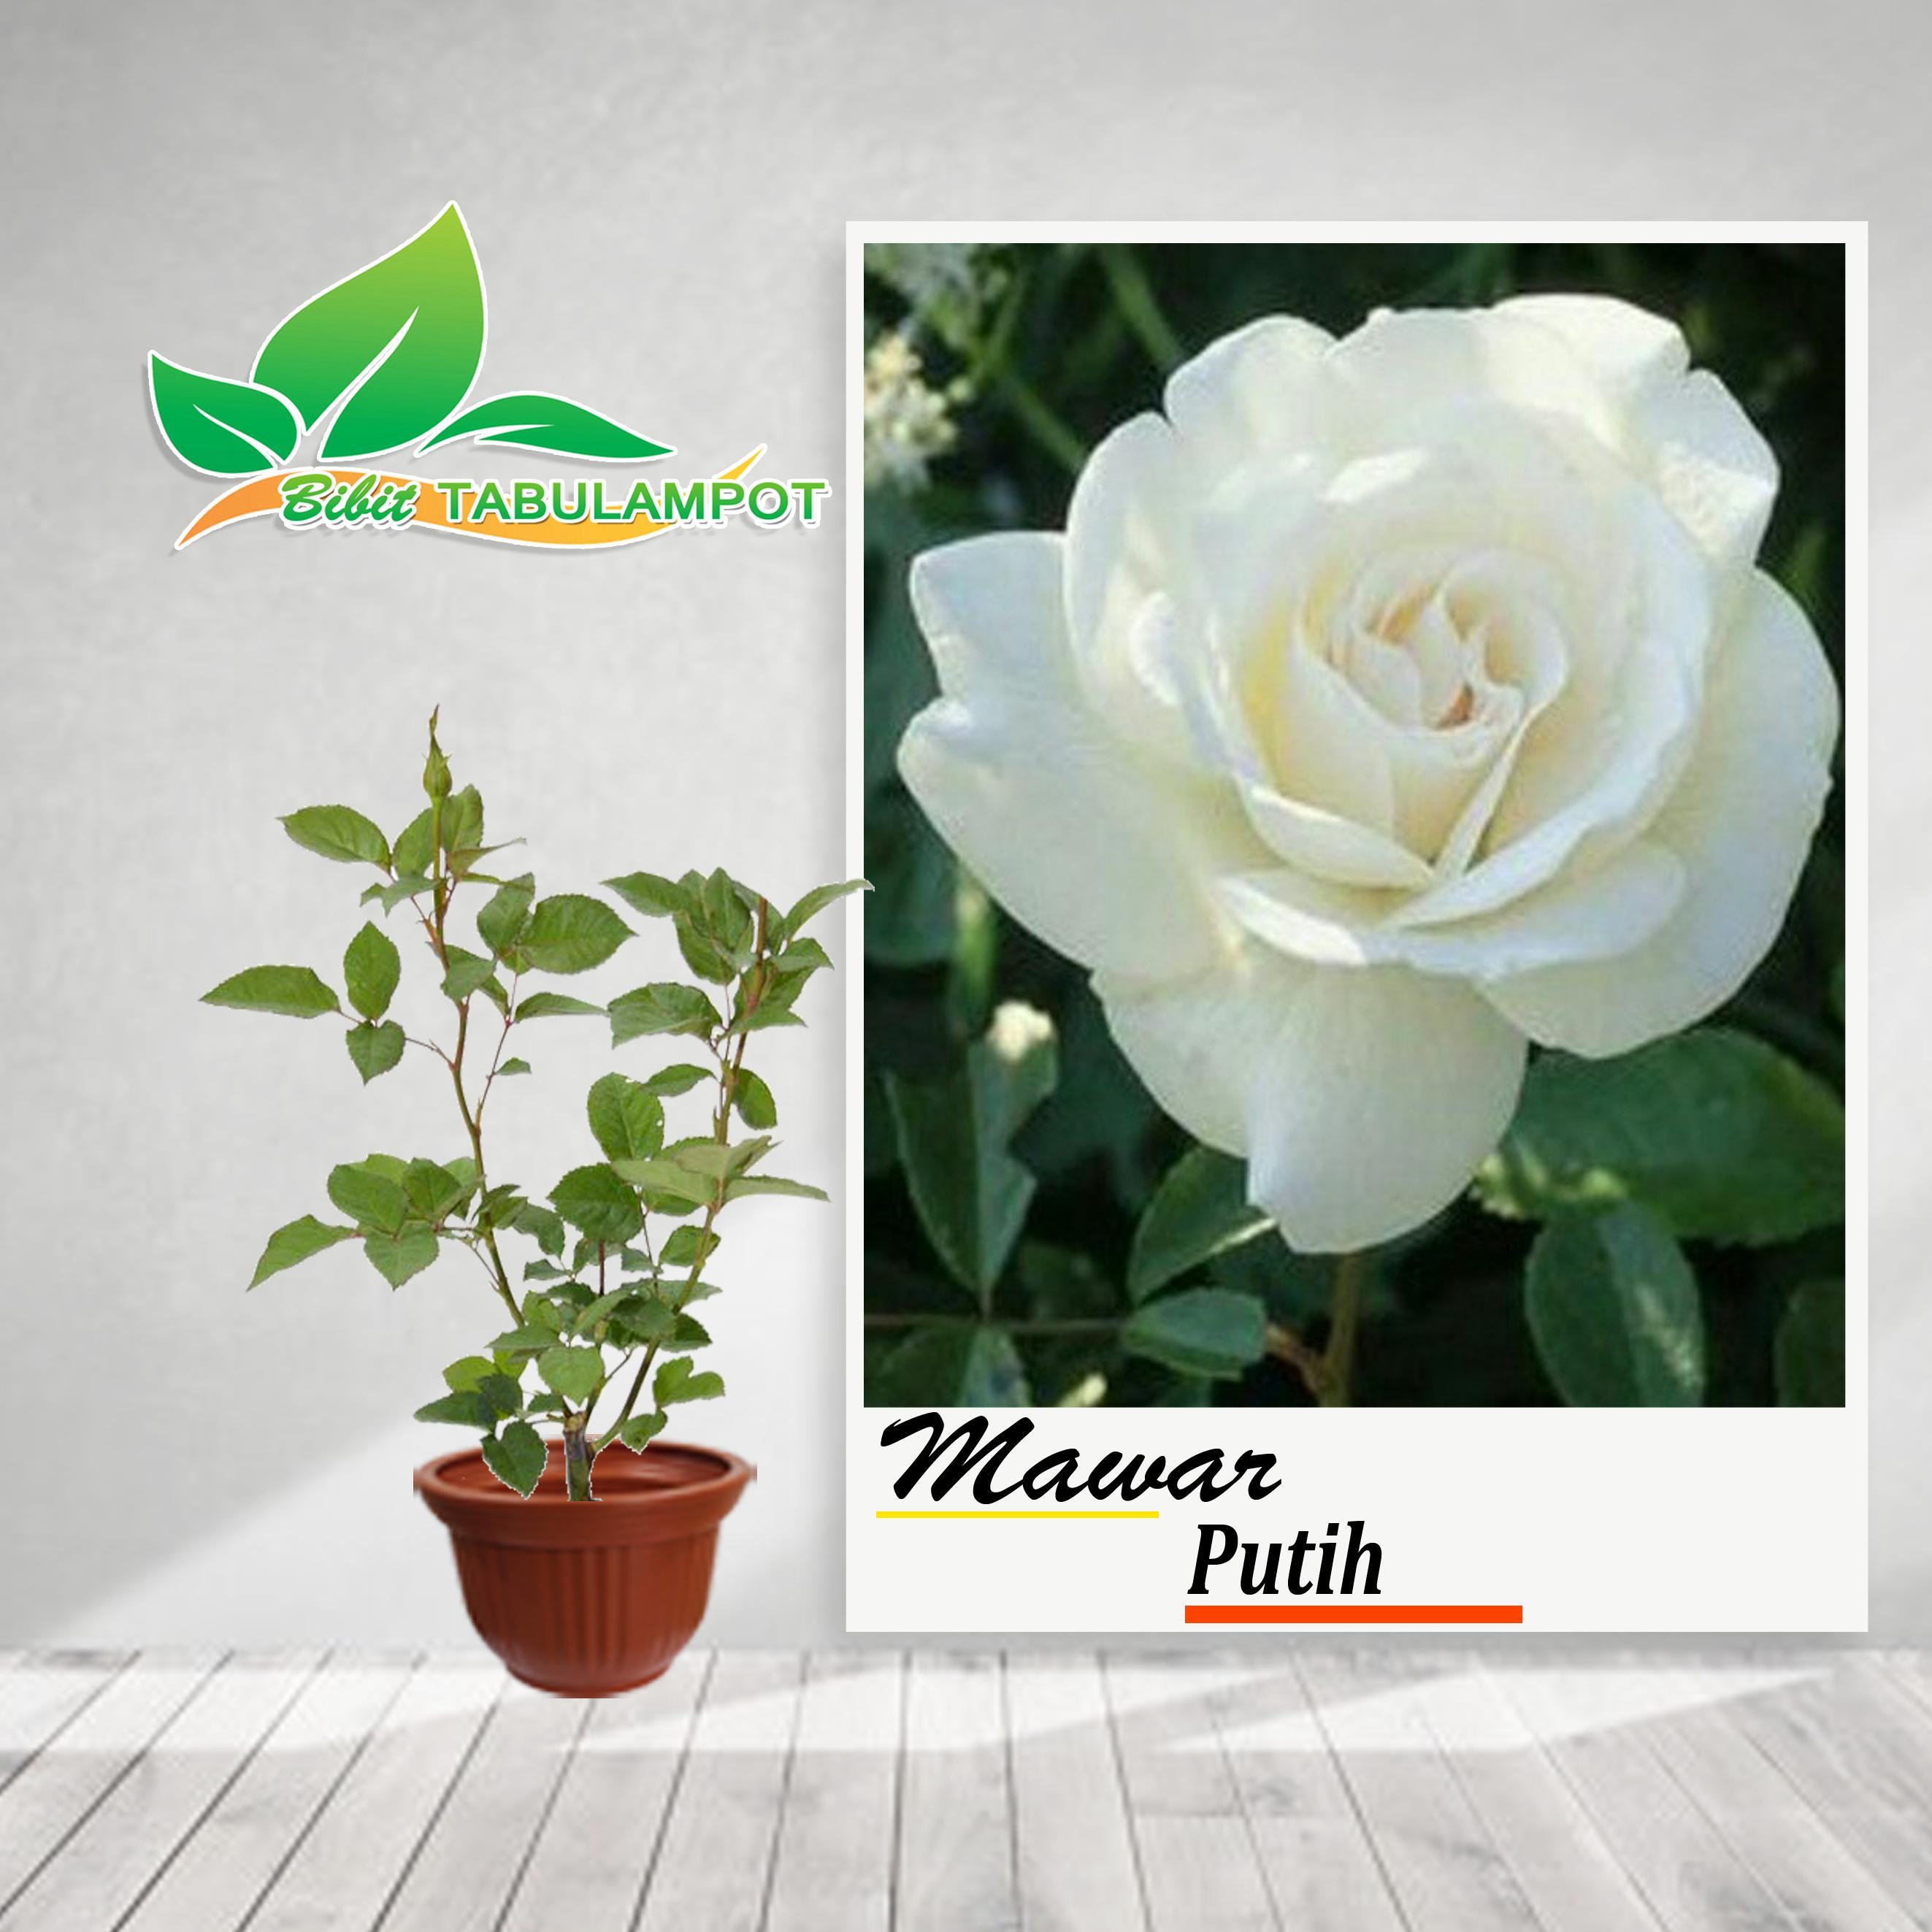 Bibit Tanaman Hias Bunga Mawar Putih Lazada Indonesia